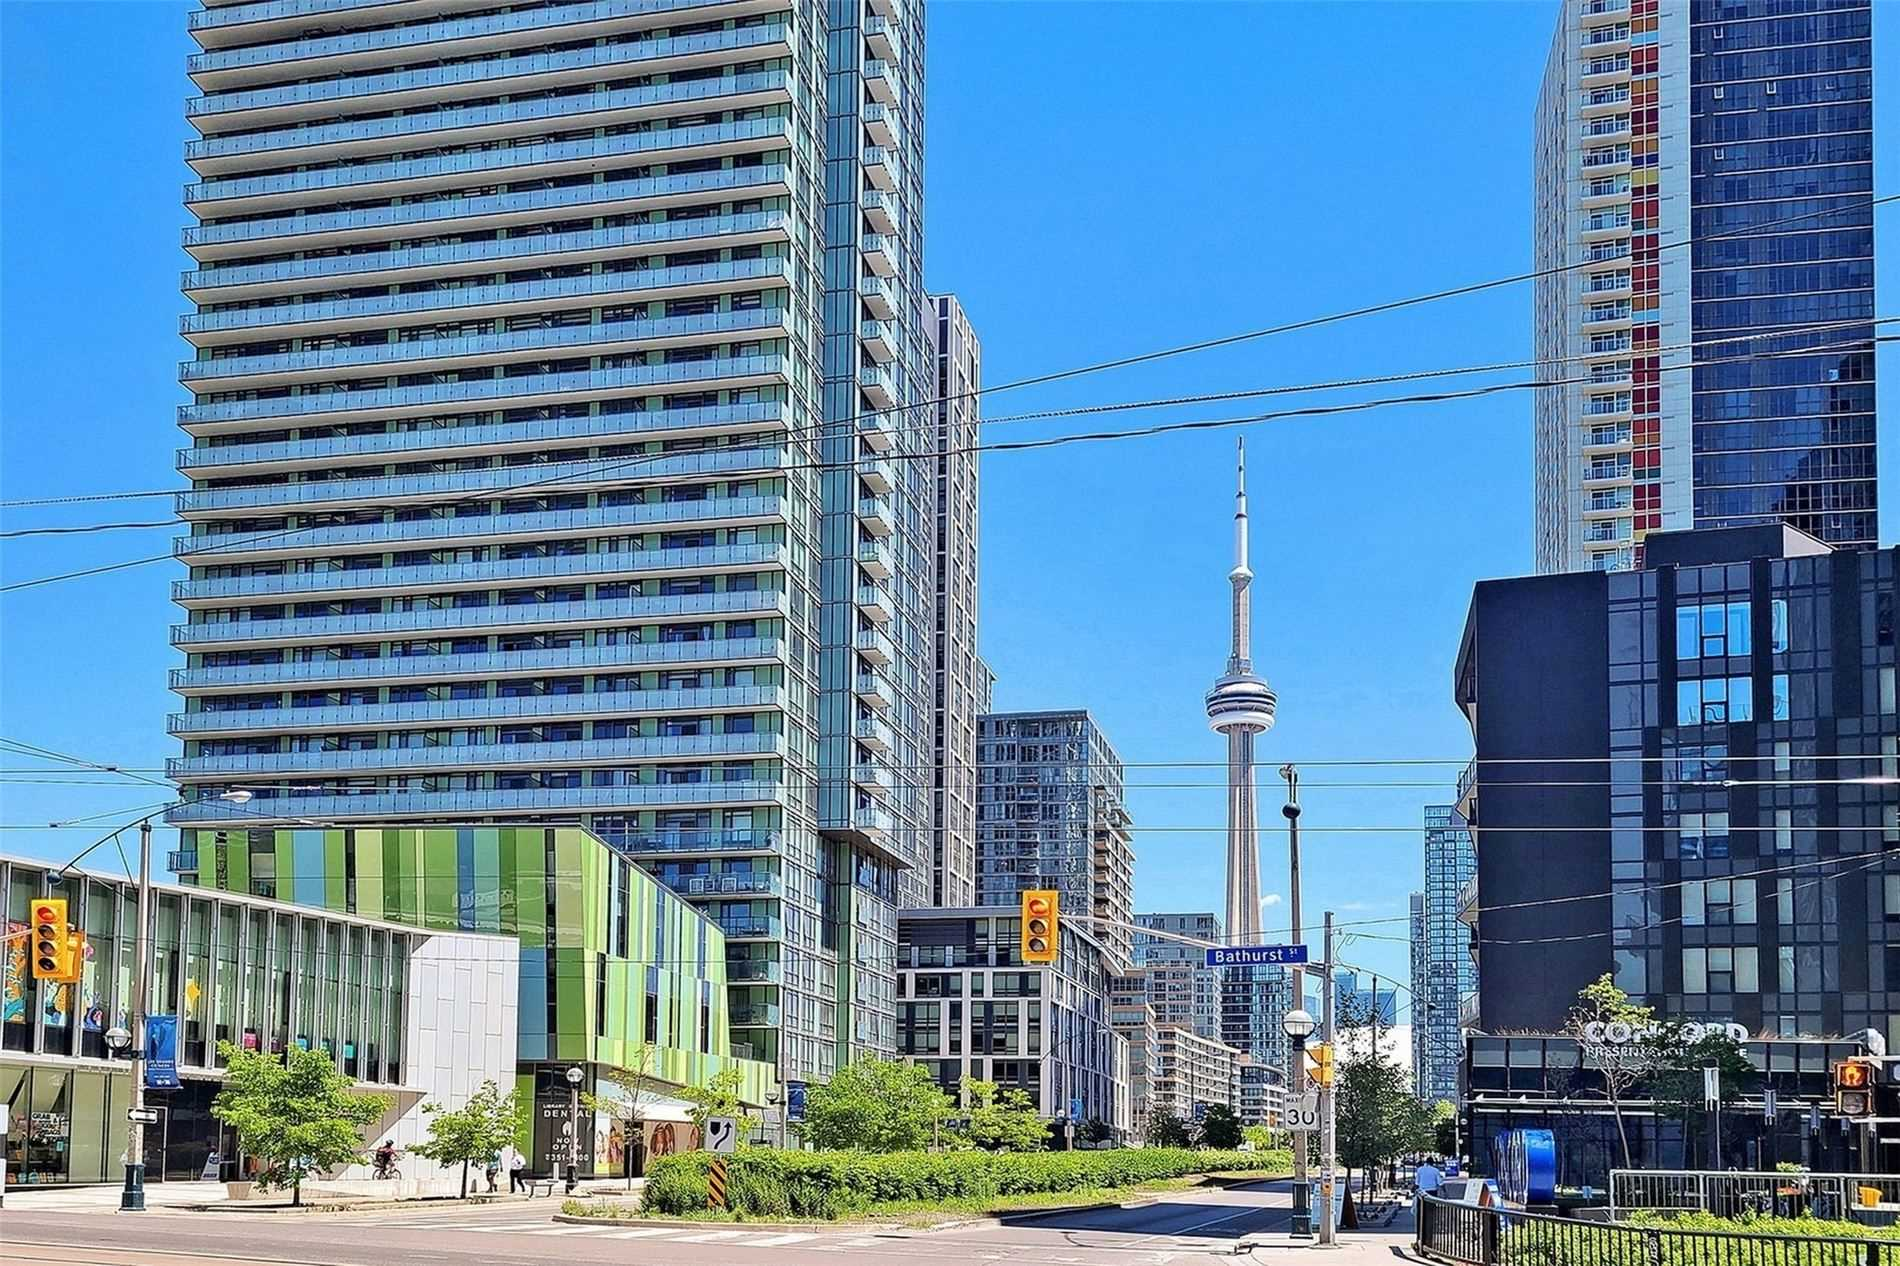 Condo Apt For Sale In Toronto , ,1 BathroomBathrooms,Condo Apt,For Sale,613,Fort York